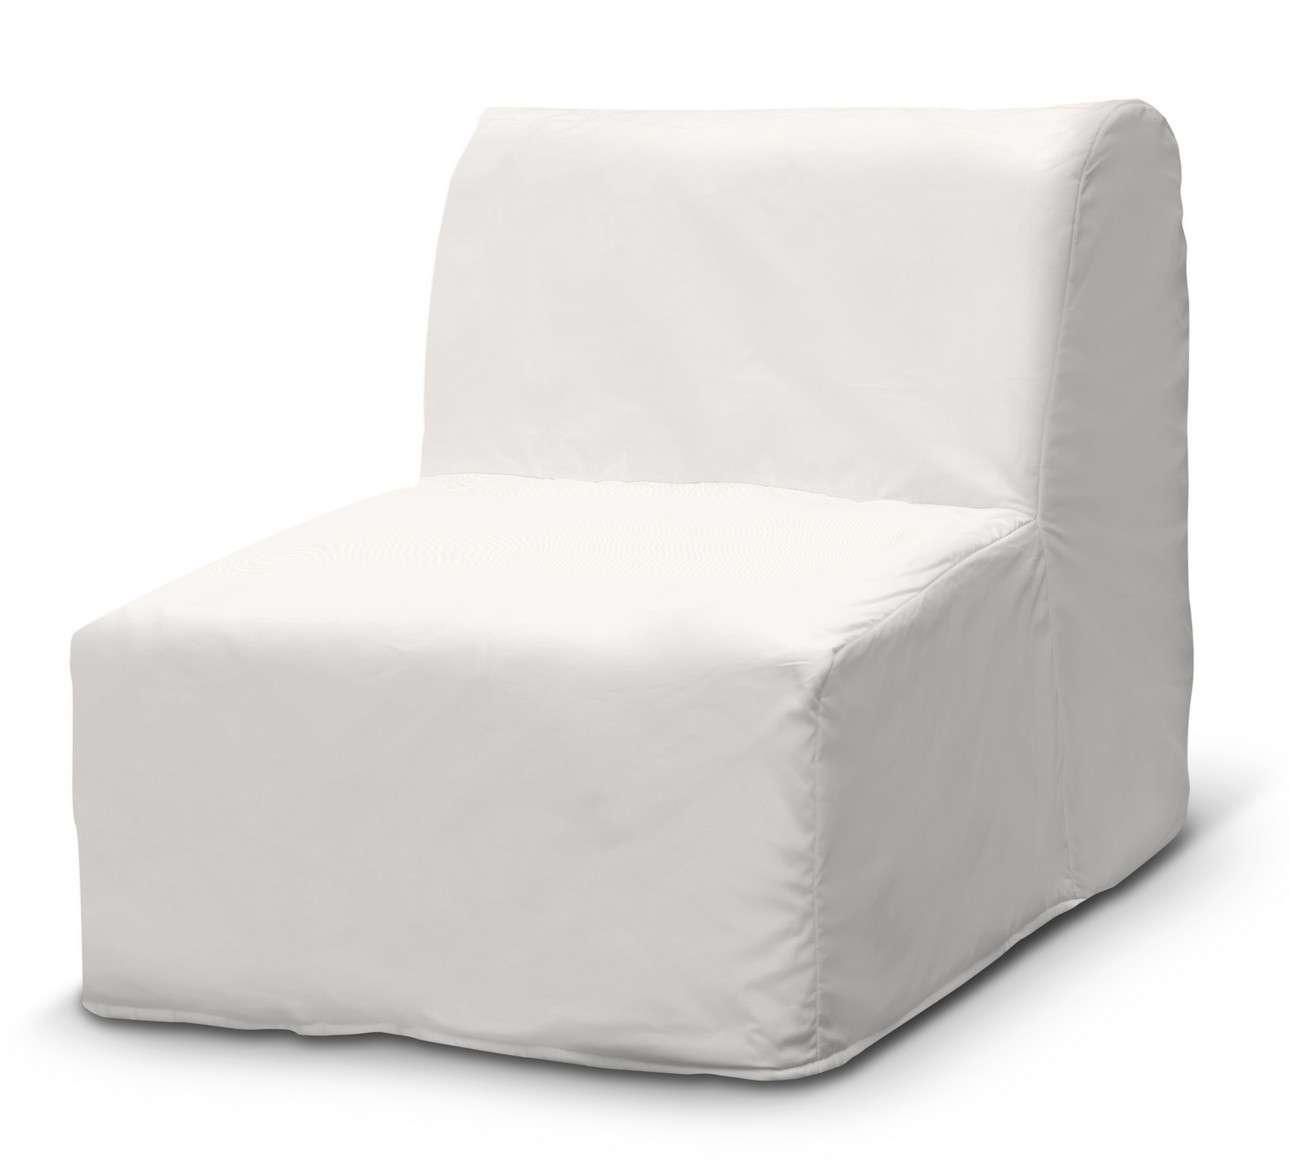 Pokrowiec na fotel Lycksele prosty fotel Lycksele w kolekcji Cotton Panama, tkanina: 702-34